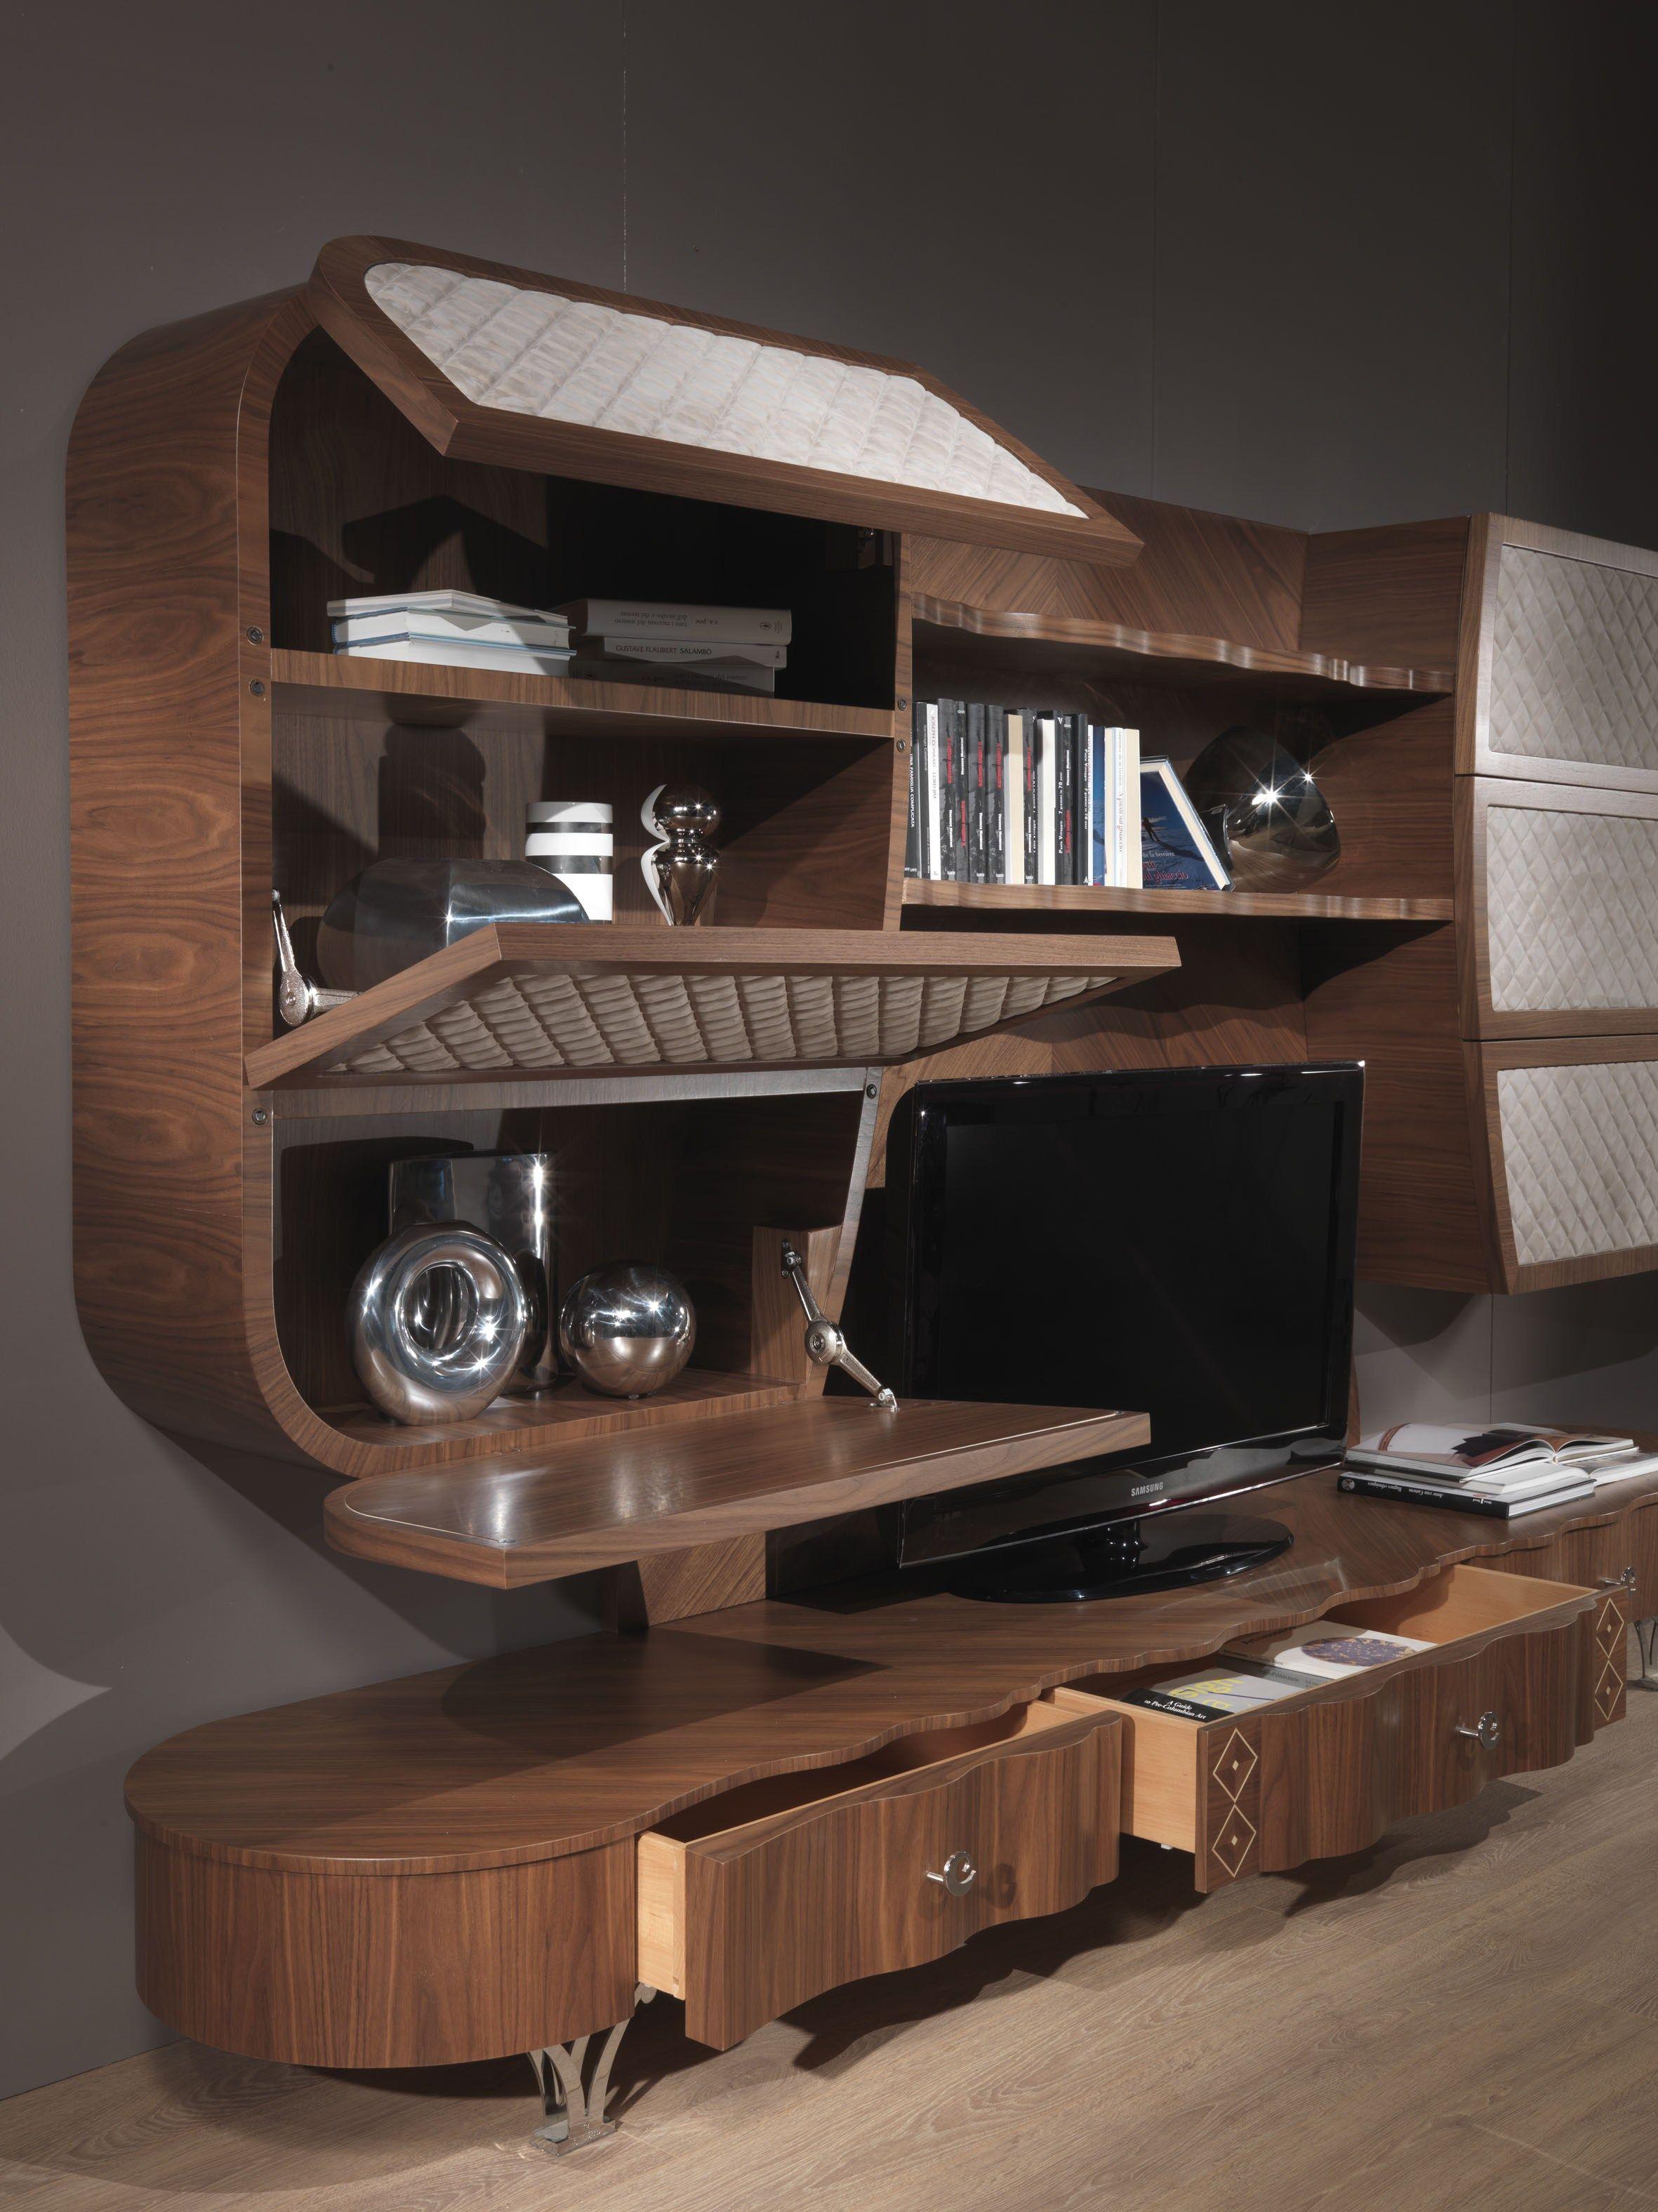 Mueble modular de pared de madera maciza con soporte para for Catalogo boom del mueble